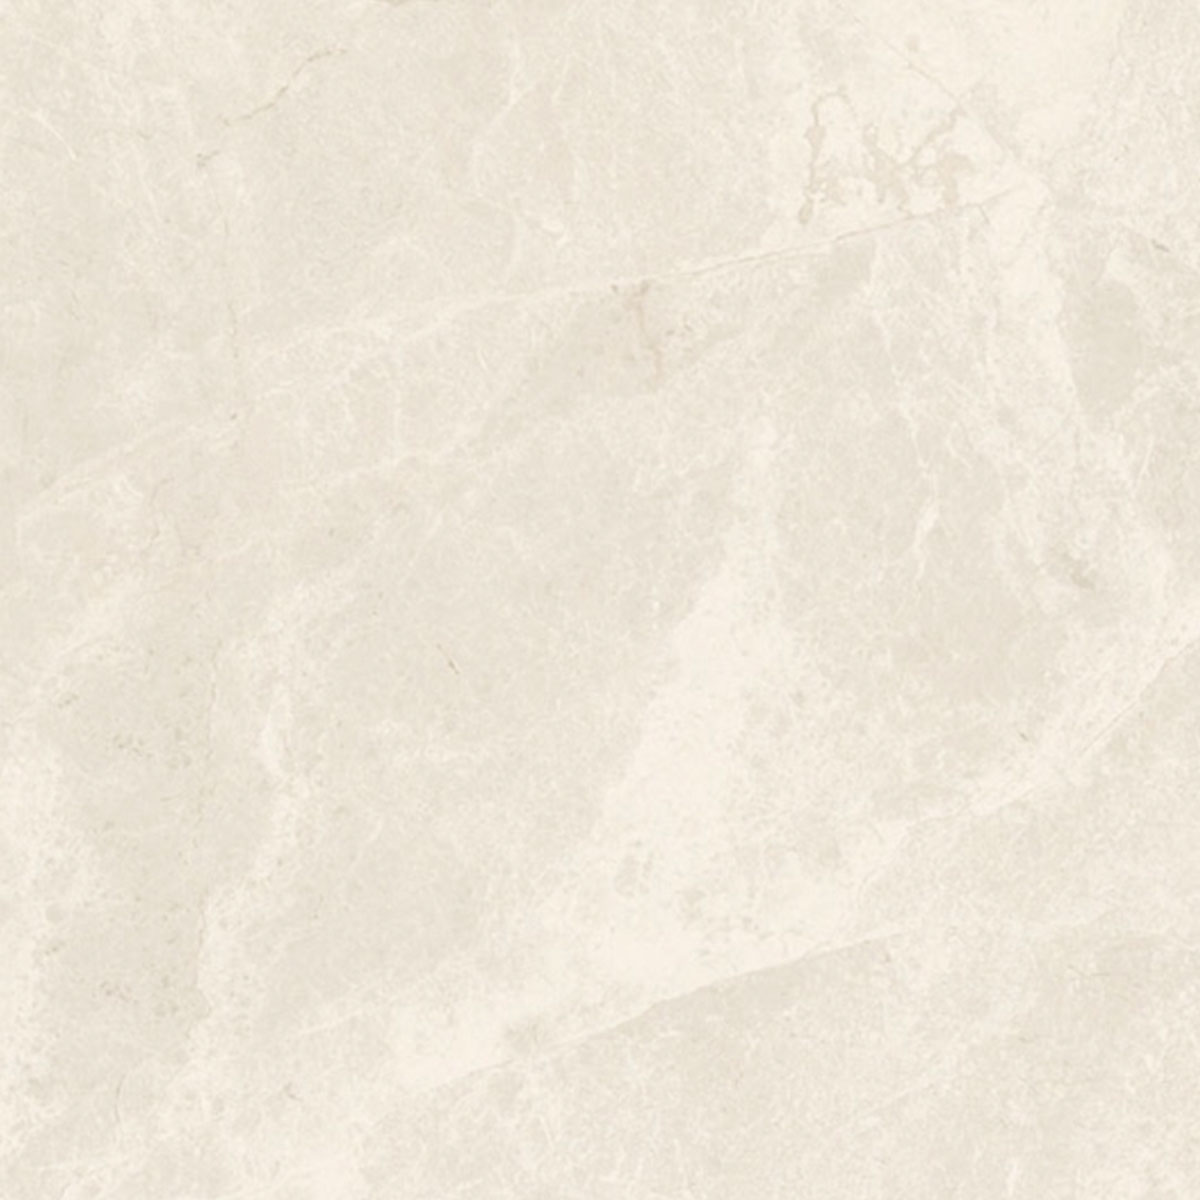 Tundra - Beige - Marble Look Tiles - Stone3 Brisbane